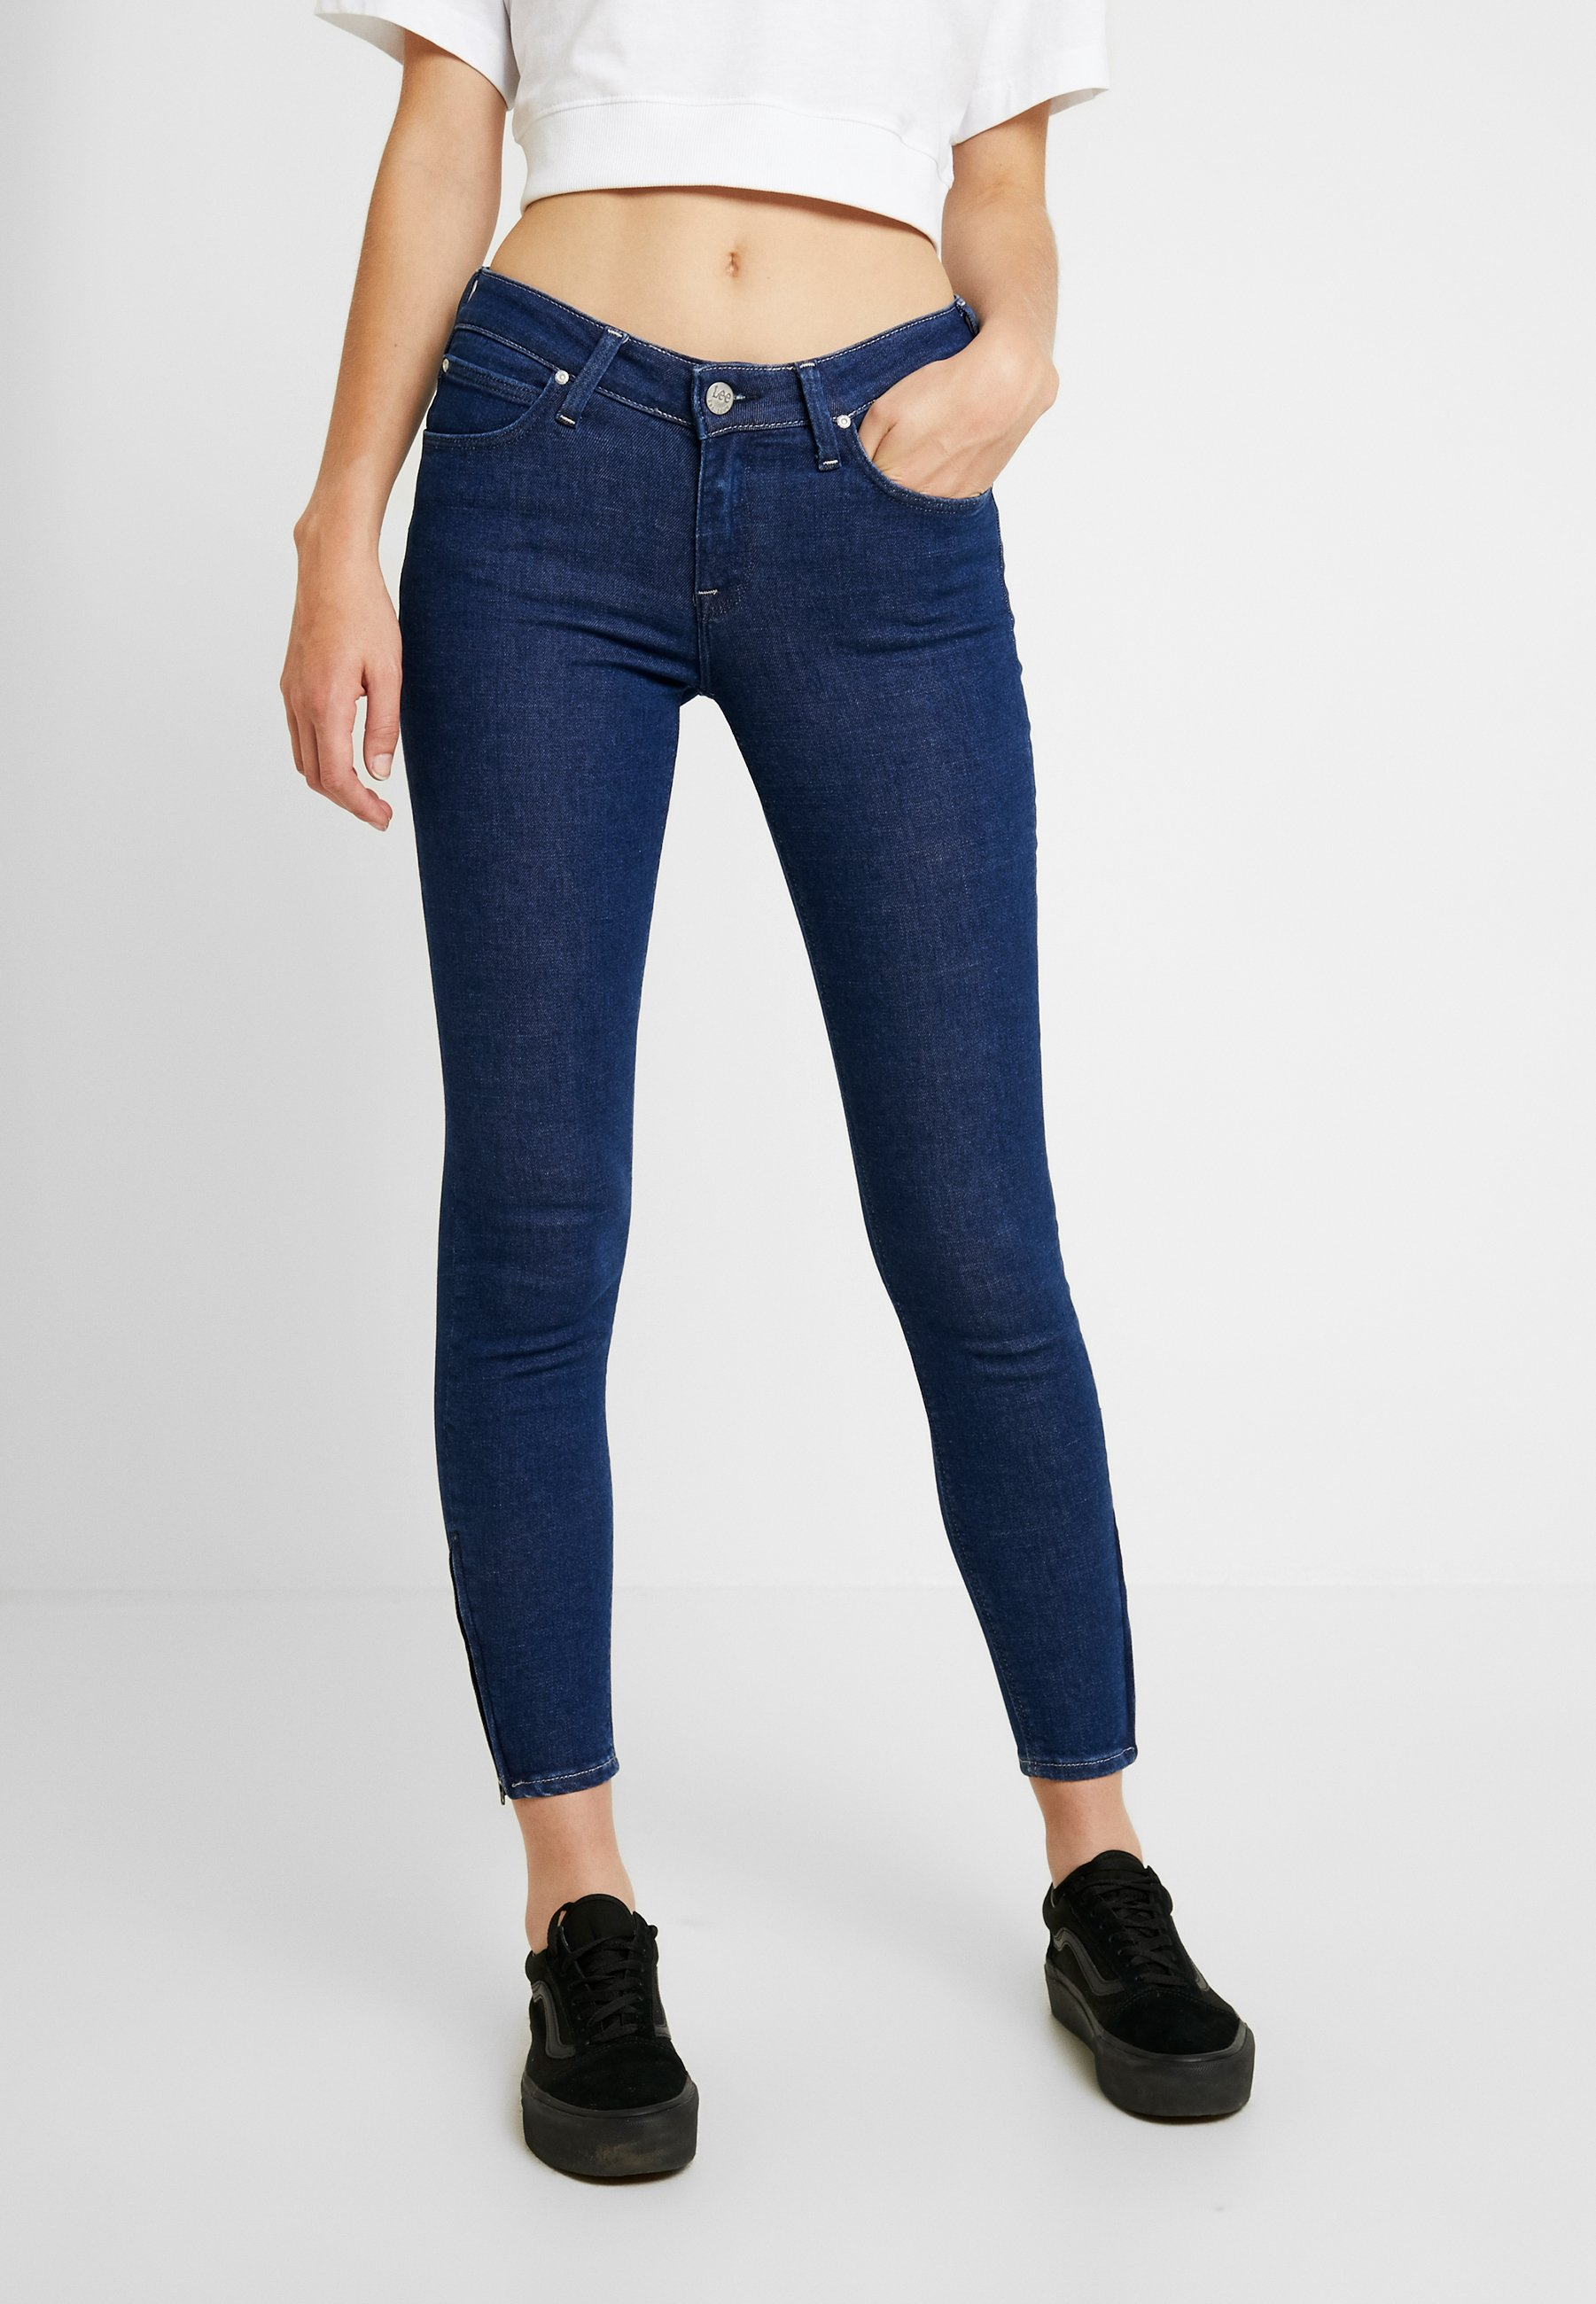 Clean Scarlett Say Skinny Lee CroppedJeans 1clTFKJ3